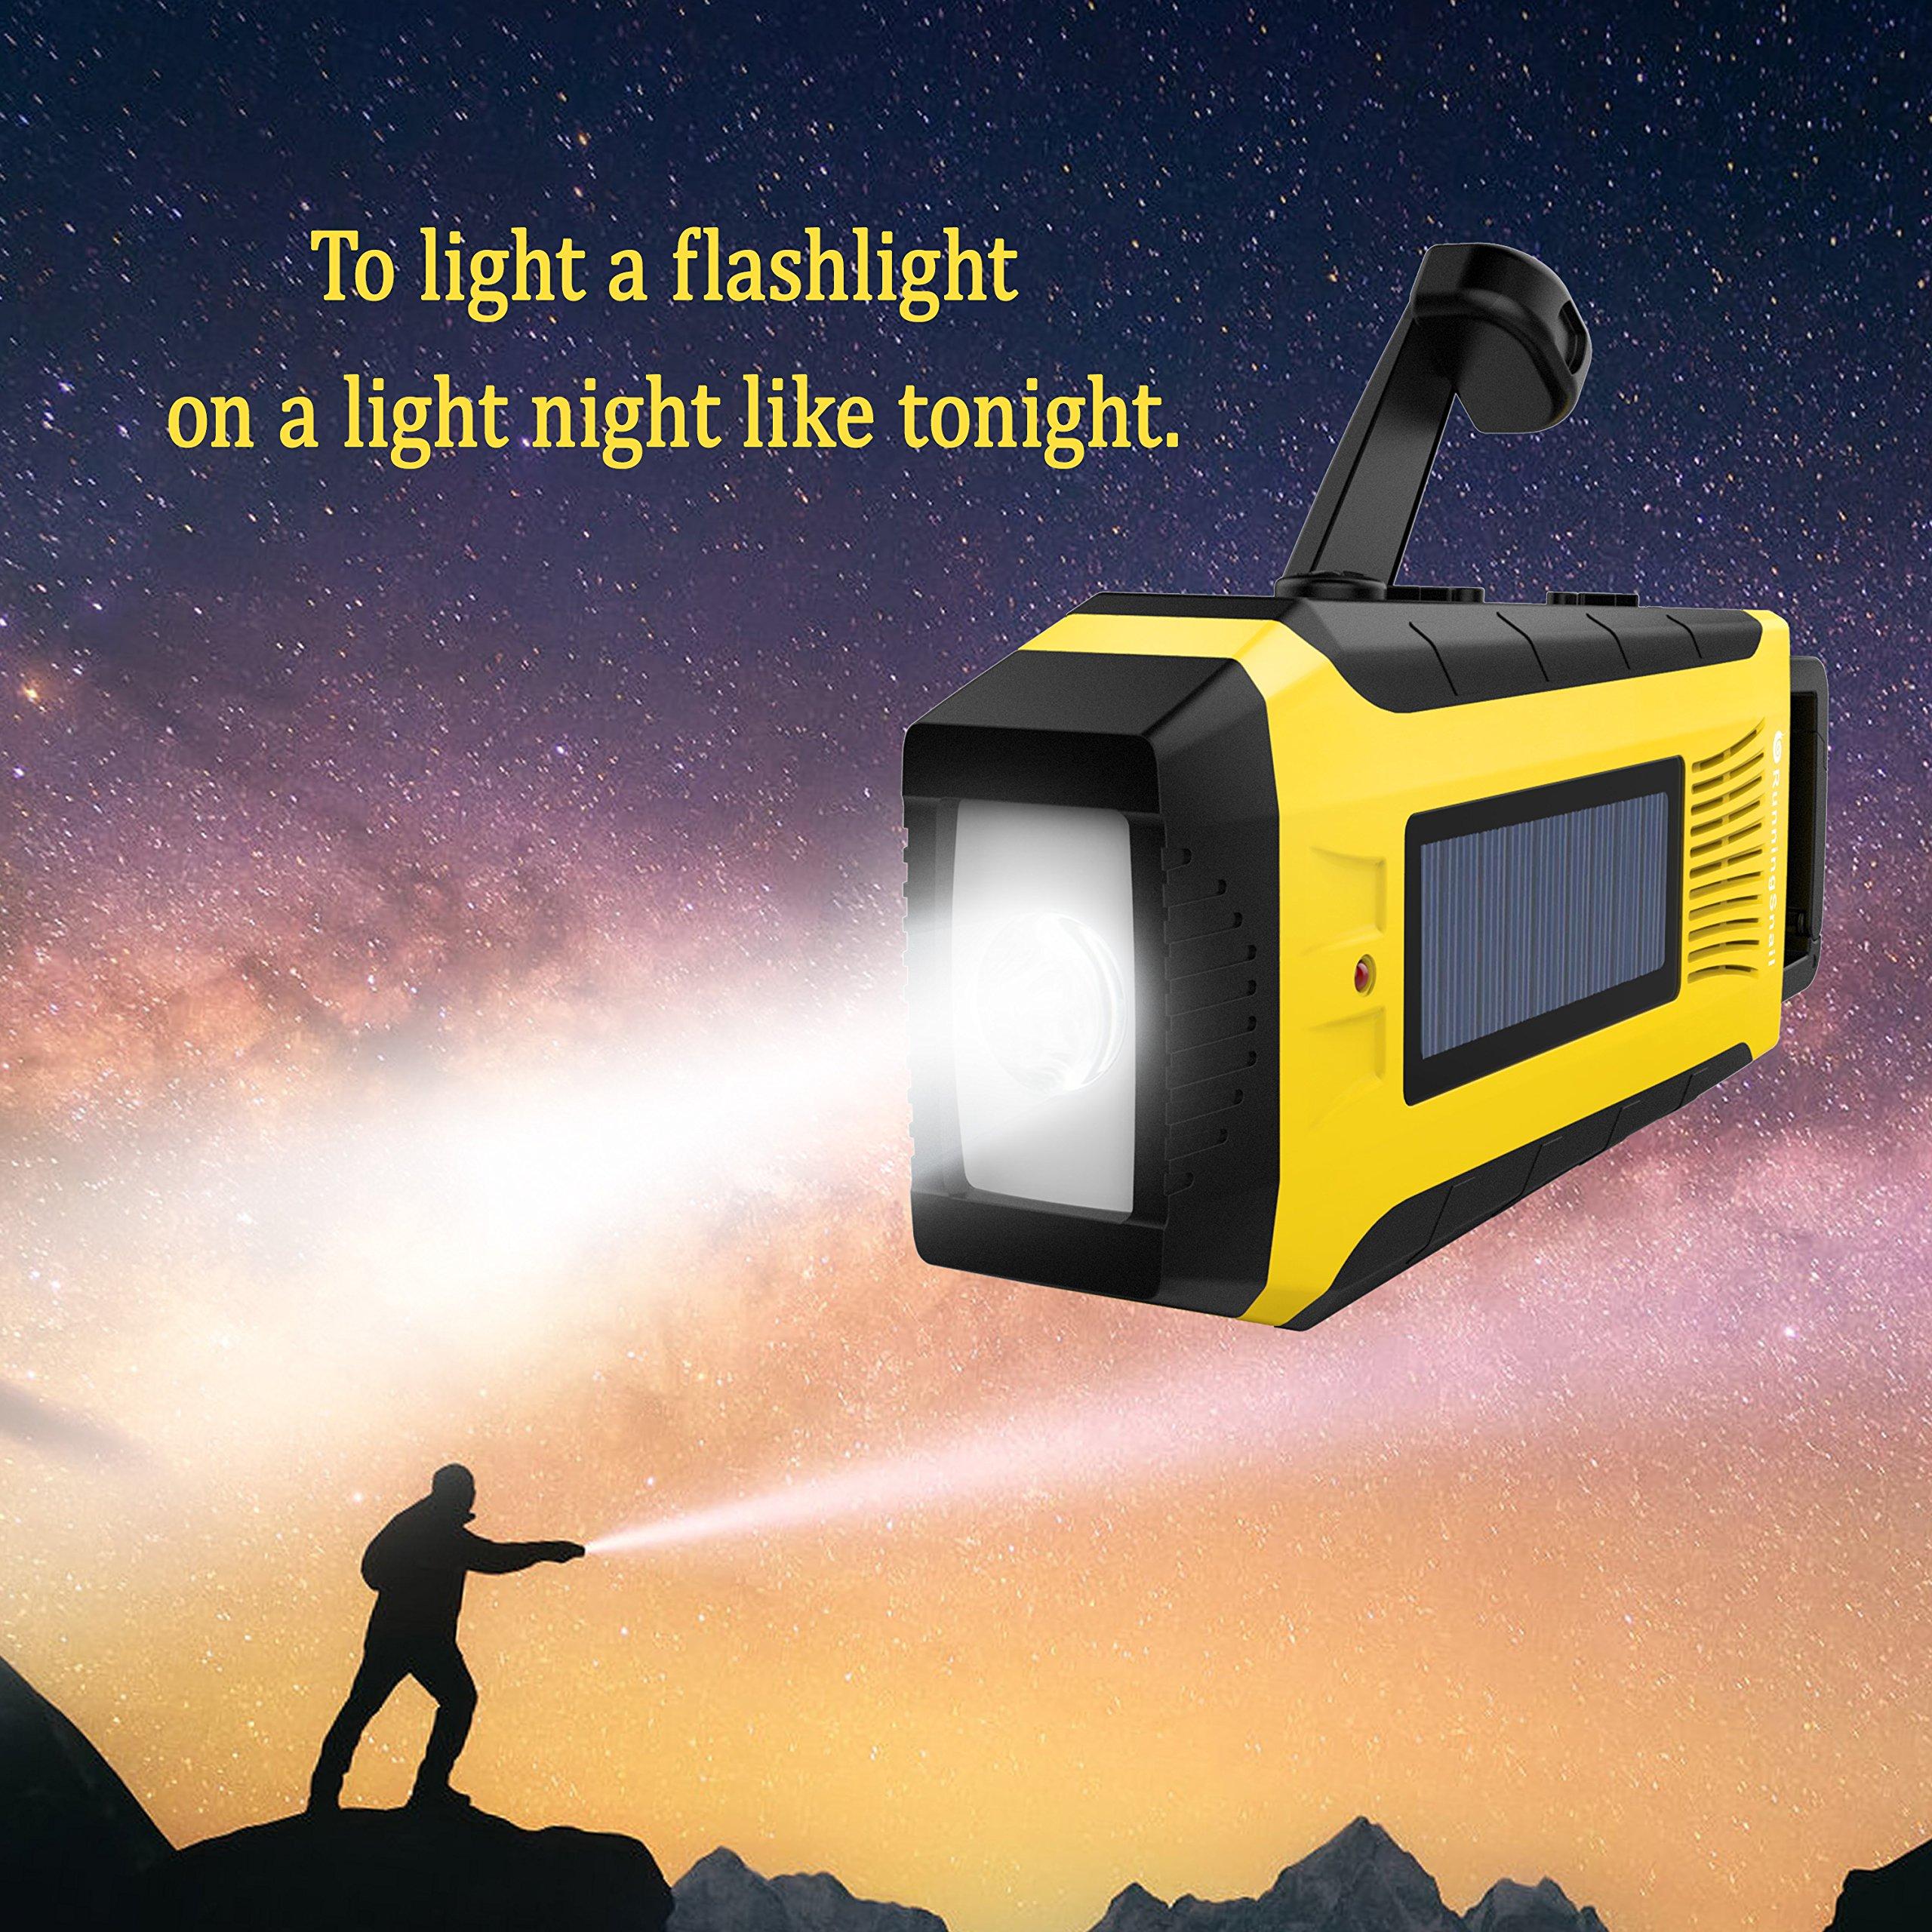 RunningSnail AM/FM NOAA Weather Emergency Solar Digital Crank Radio with 3W LED Flashlight, SOS Alarm & 2000MAh Power Bank(Yellow) … by RunningSnail (Image #4)